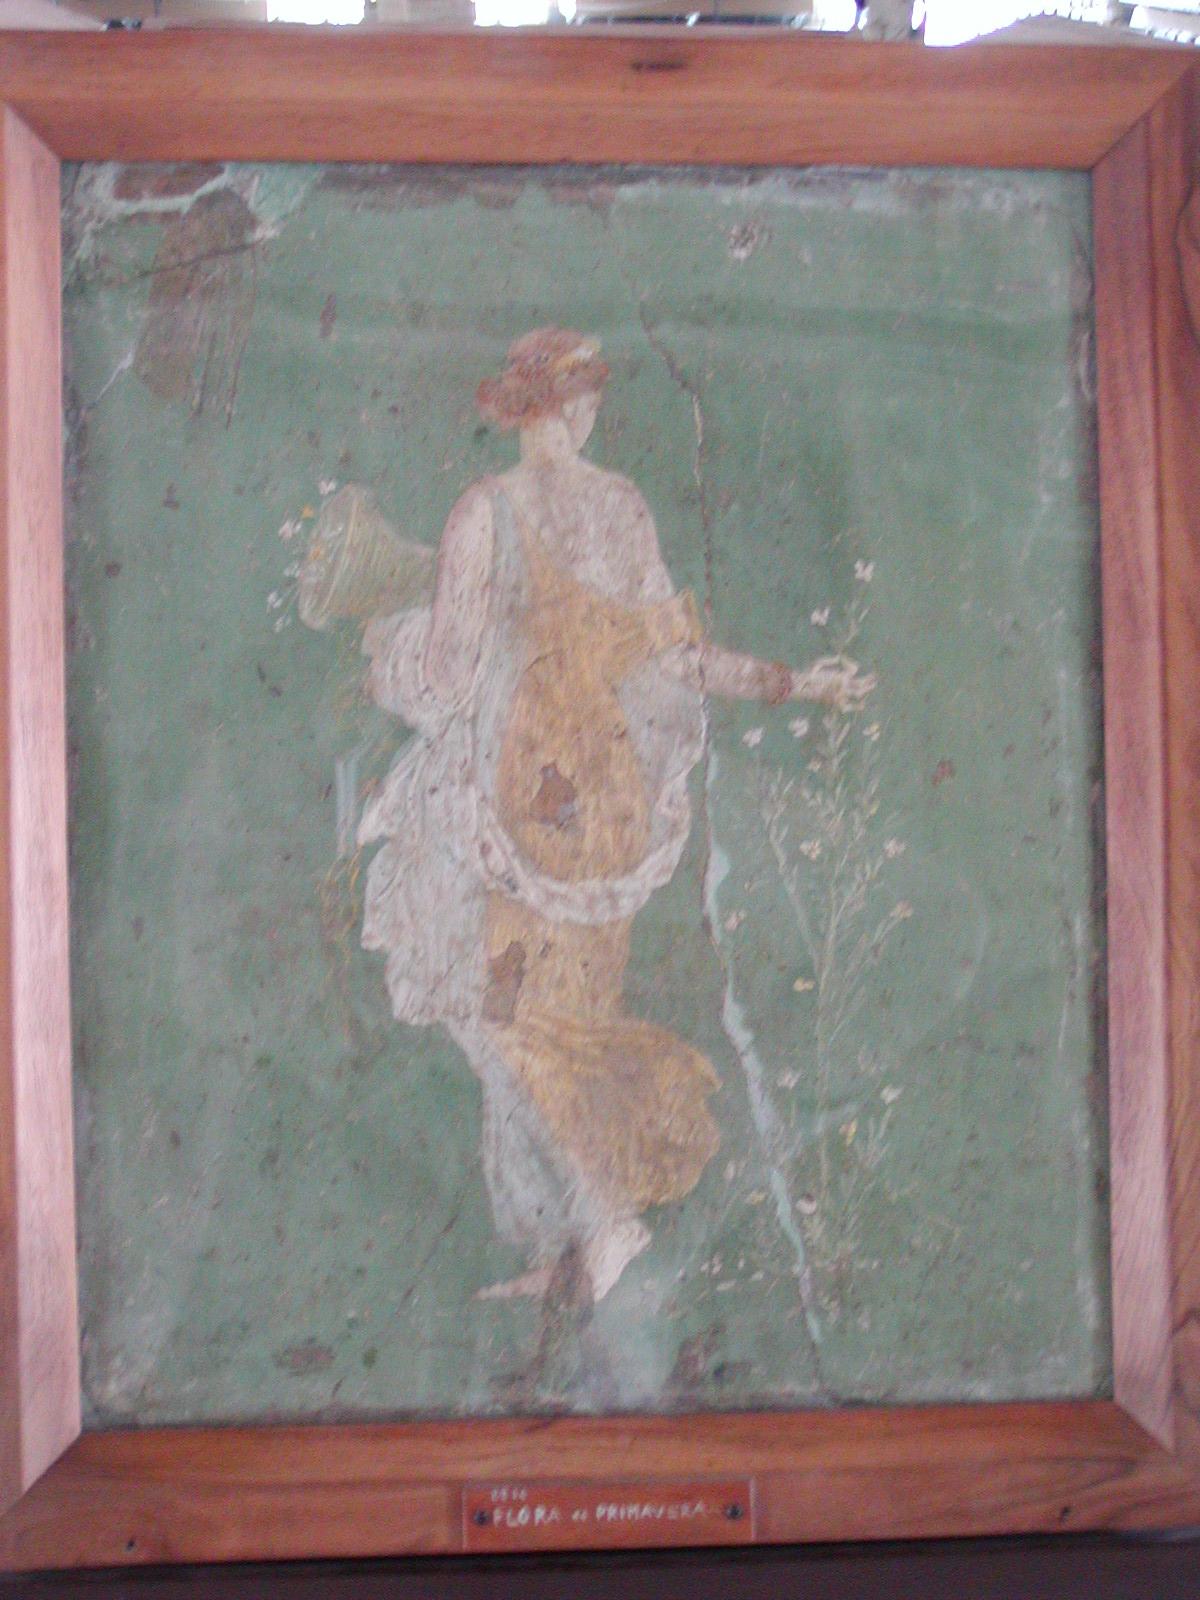 Museo Archeologico Nazionale - 2002-09-13-123600